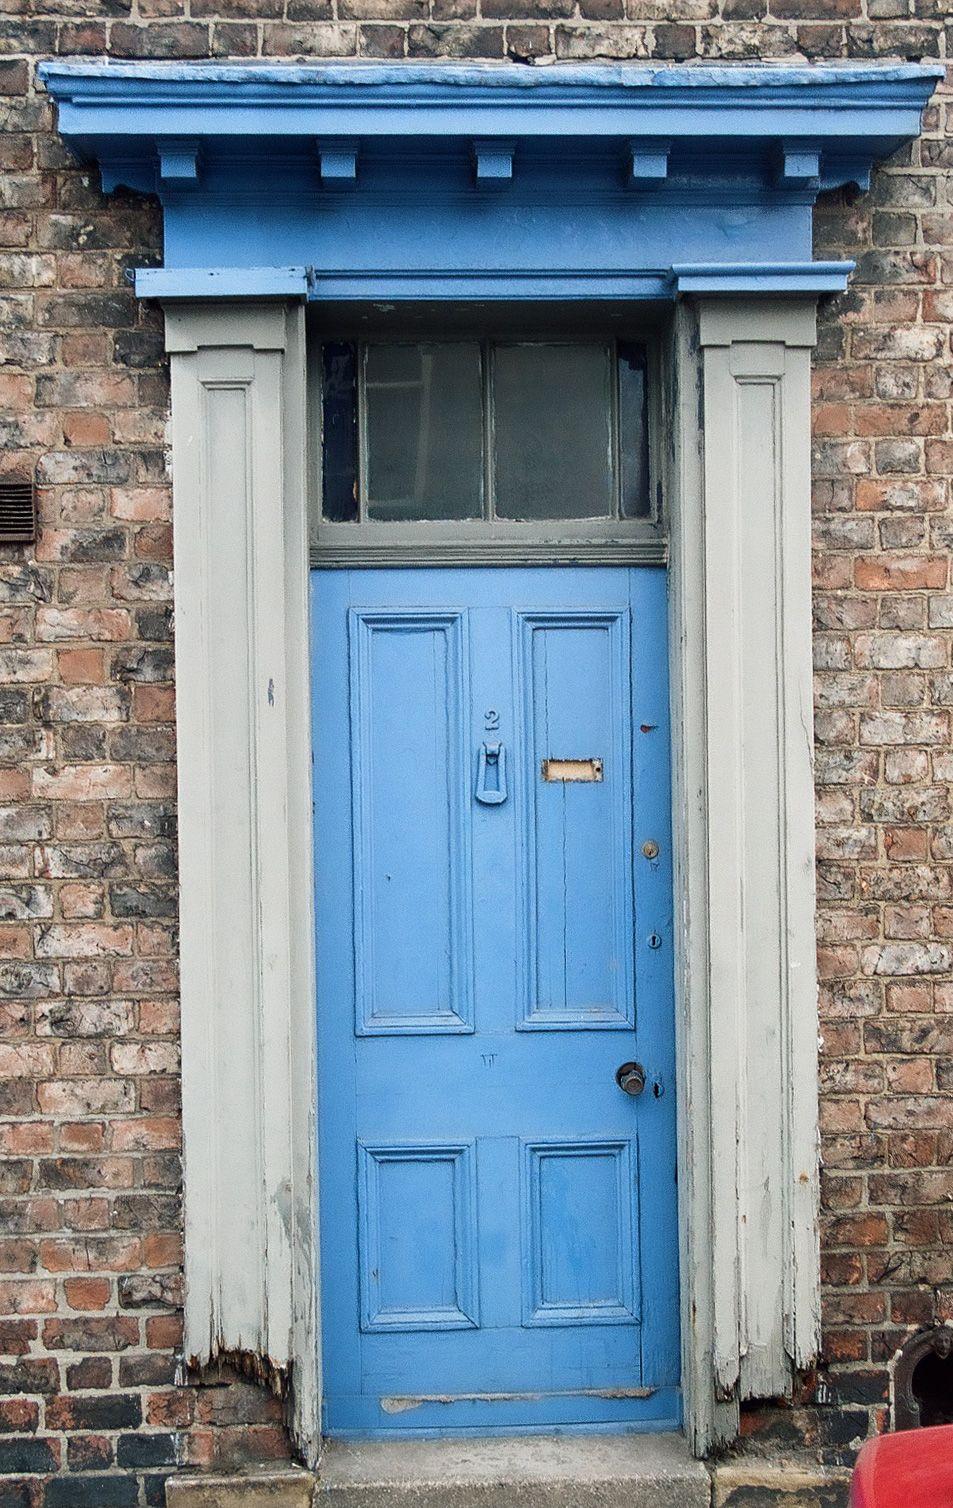 The Doors of York: Blue